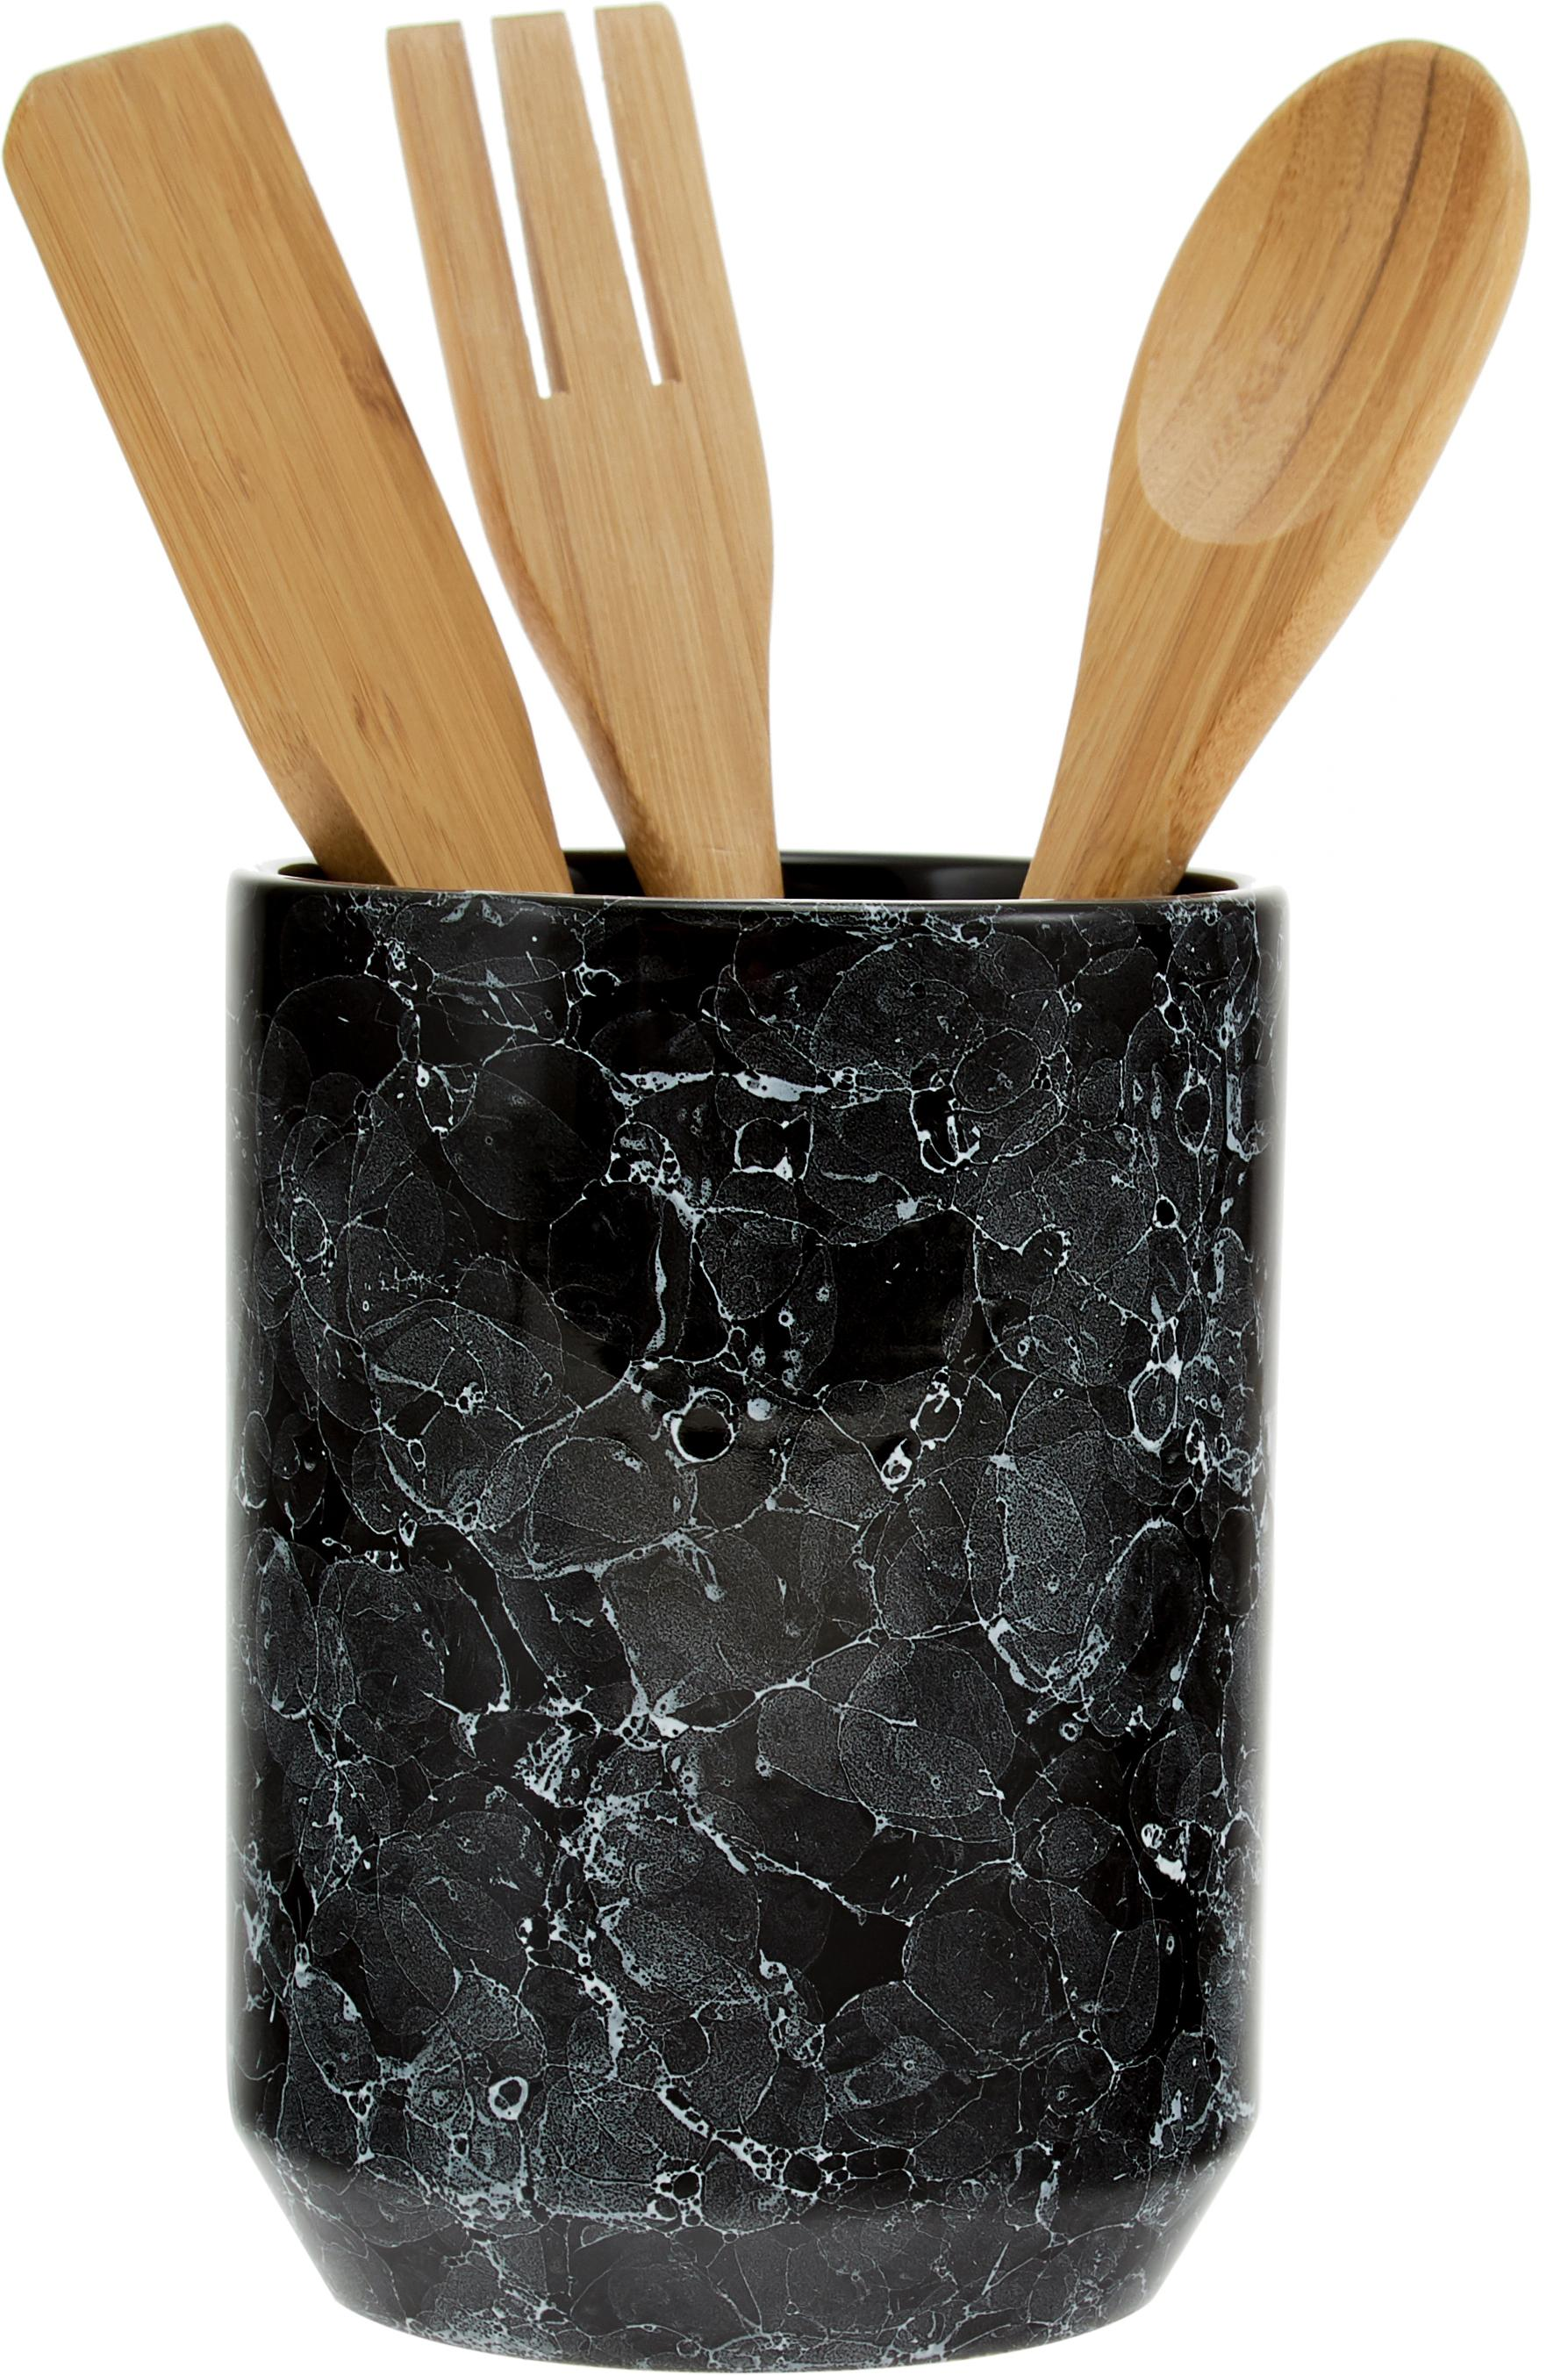 Keukengereiset Bubble, 4-delig, Keukengereihouder: keramiek, Keukengerei: hout, Zwart, bruin, Ø 11 x H 24 cm